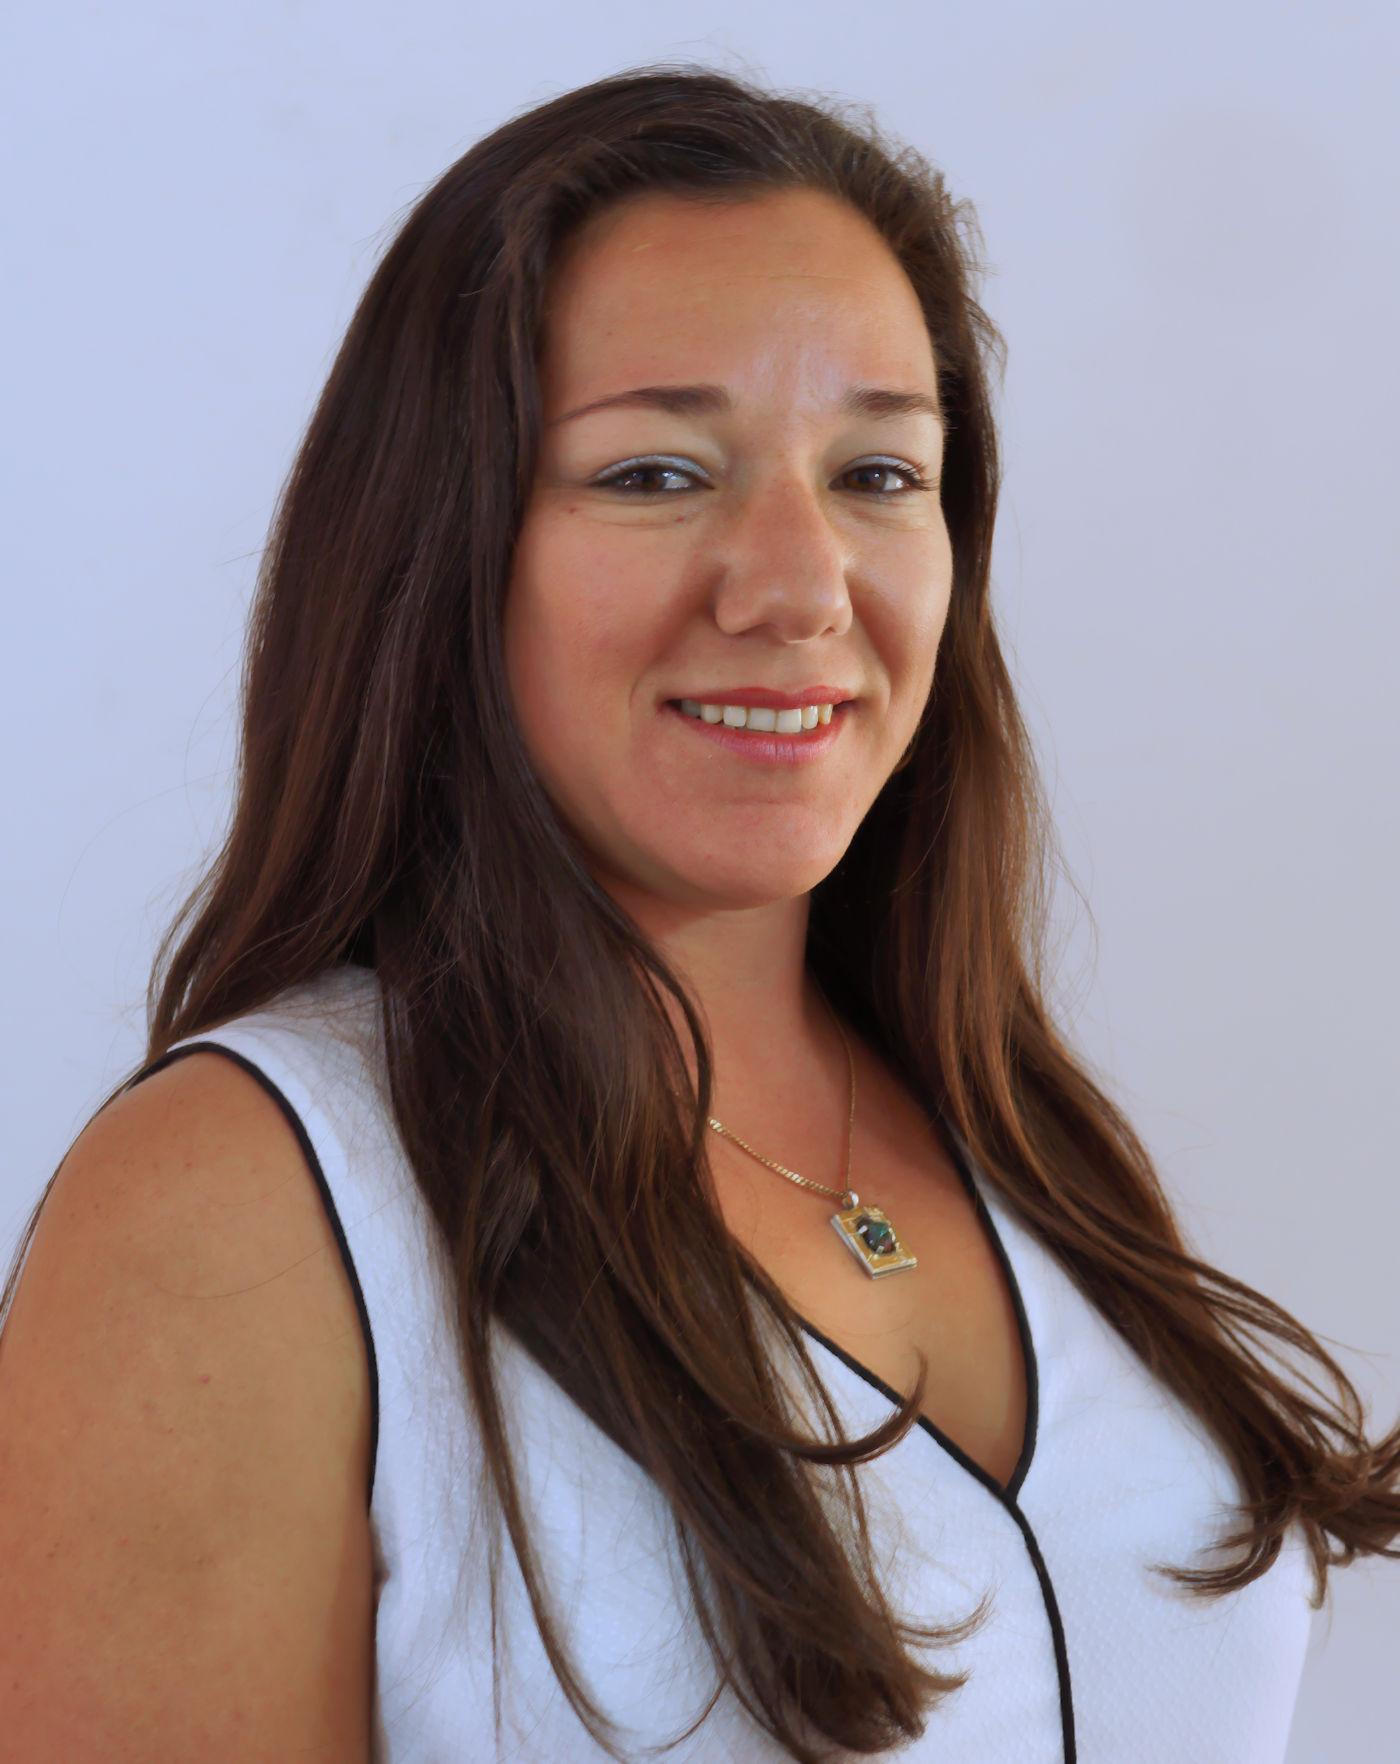 Ximena Dominguez